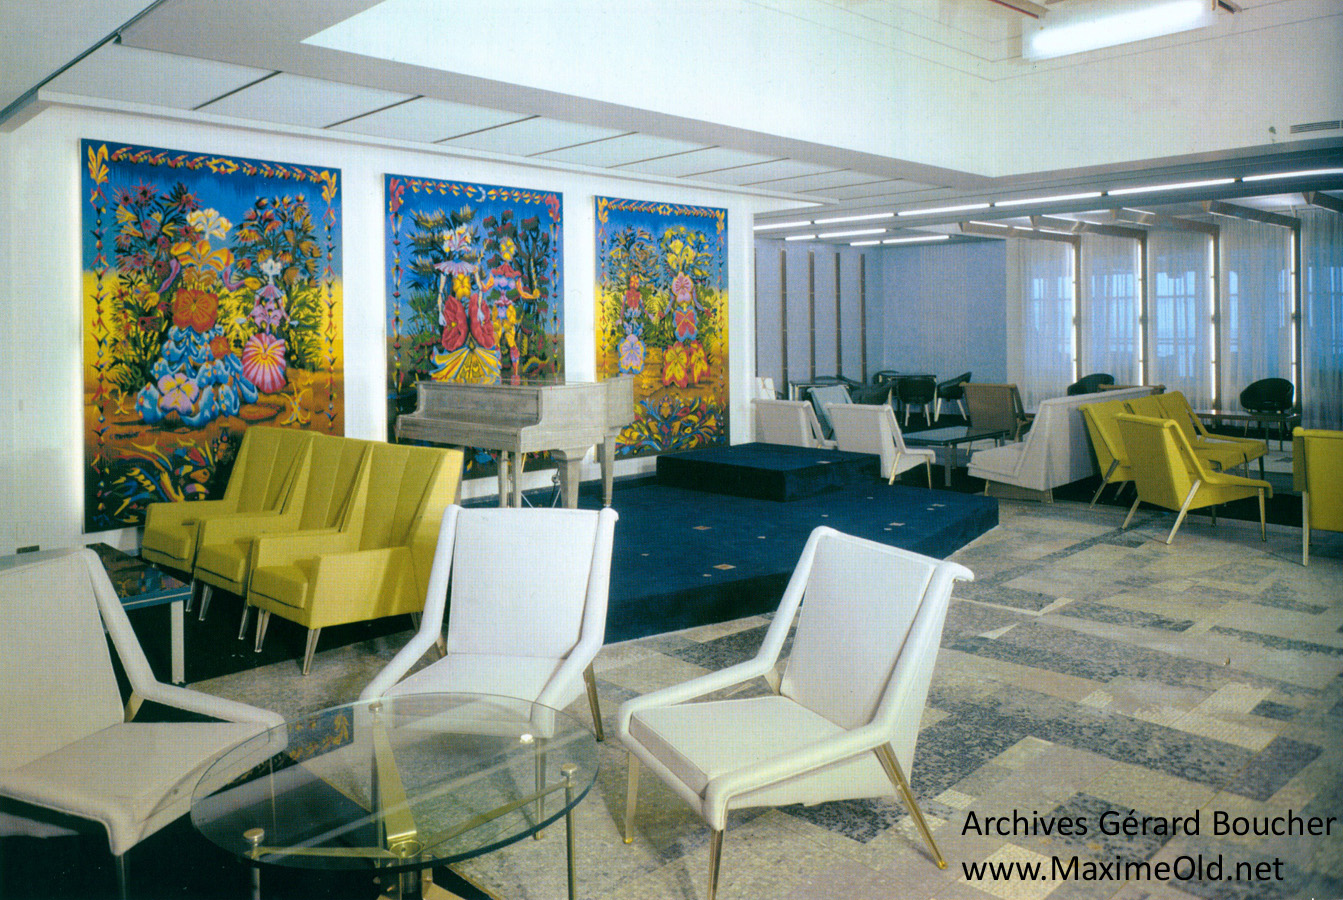 cruise liners legend exhibition 2013 maxime old modern art furniture. Black Bedroom Furniture Sets. Home Design Ideas